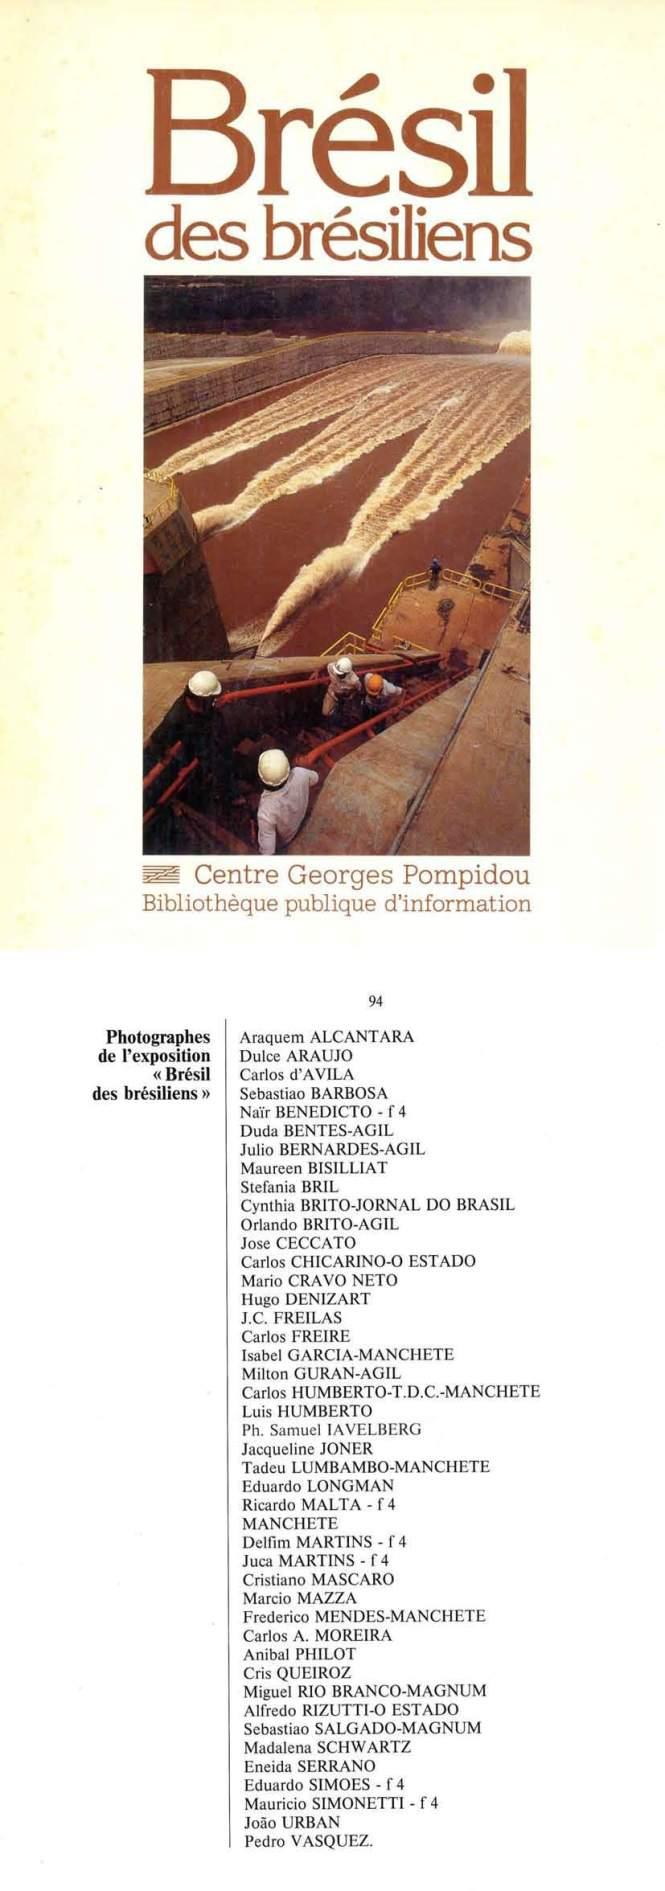 Dulce Araújo - Exposição Coletiva - Bresil des Bresiliens - Centre Georges Pompidou